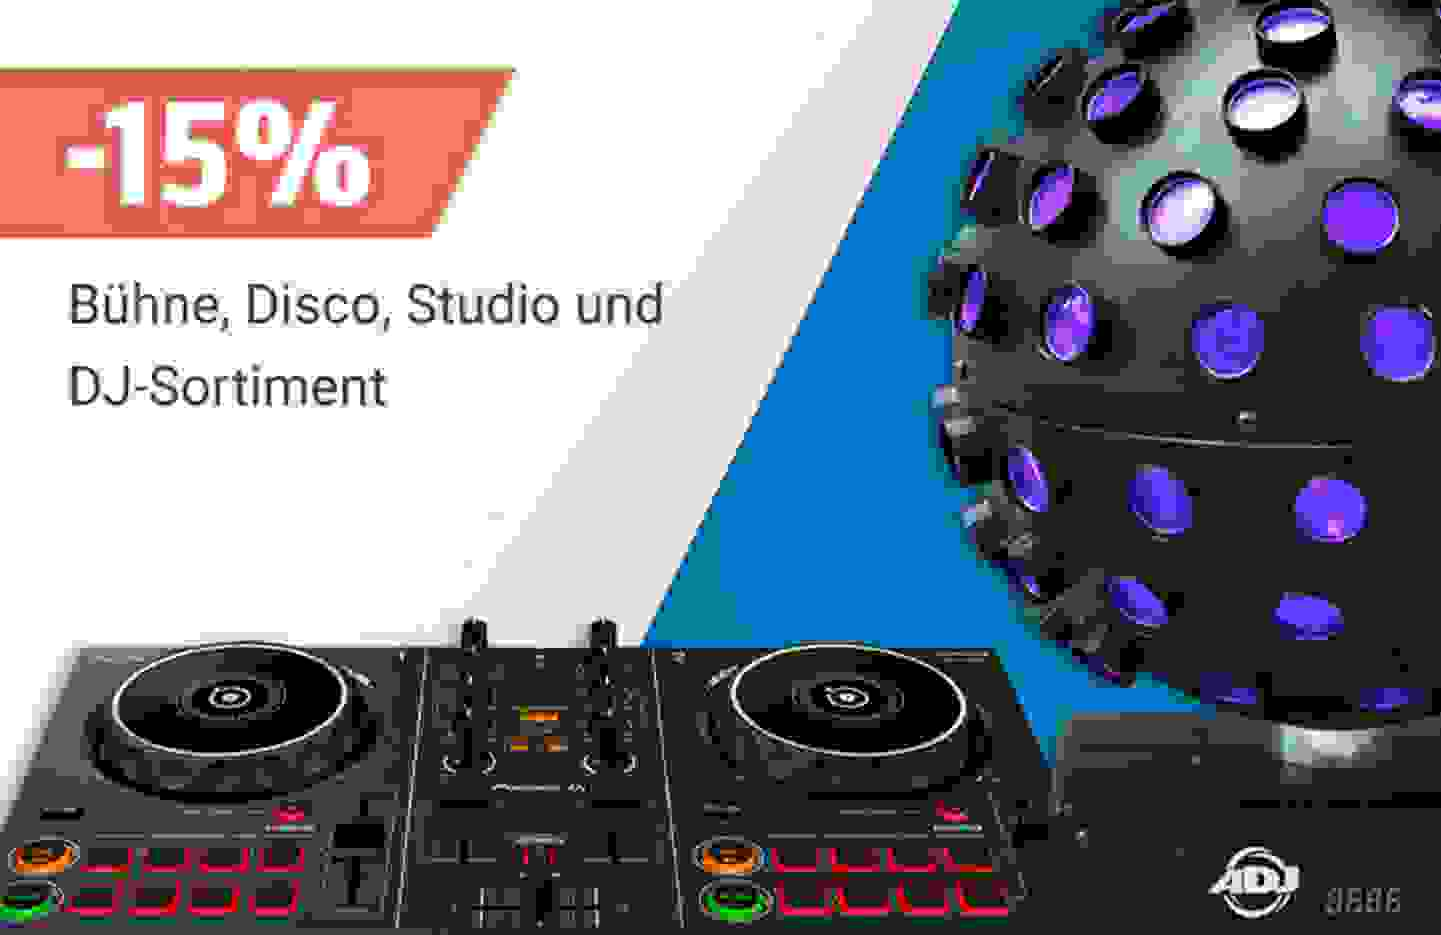 Sortimentsrabatt: 15% Rabatt auf das gesamte Bühne, Disco, Studio und DJ-Sortiment - Jetzt profitieren »